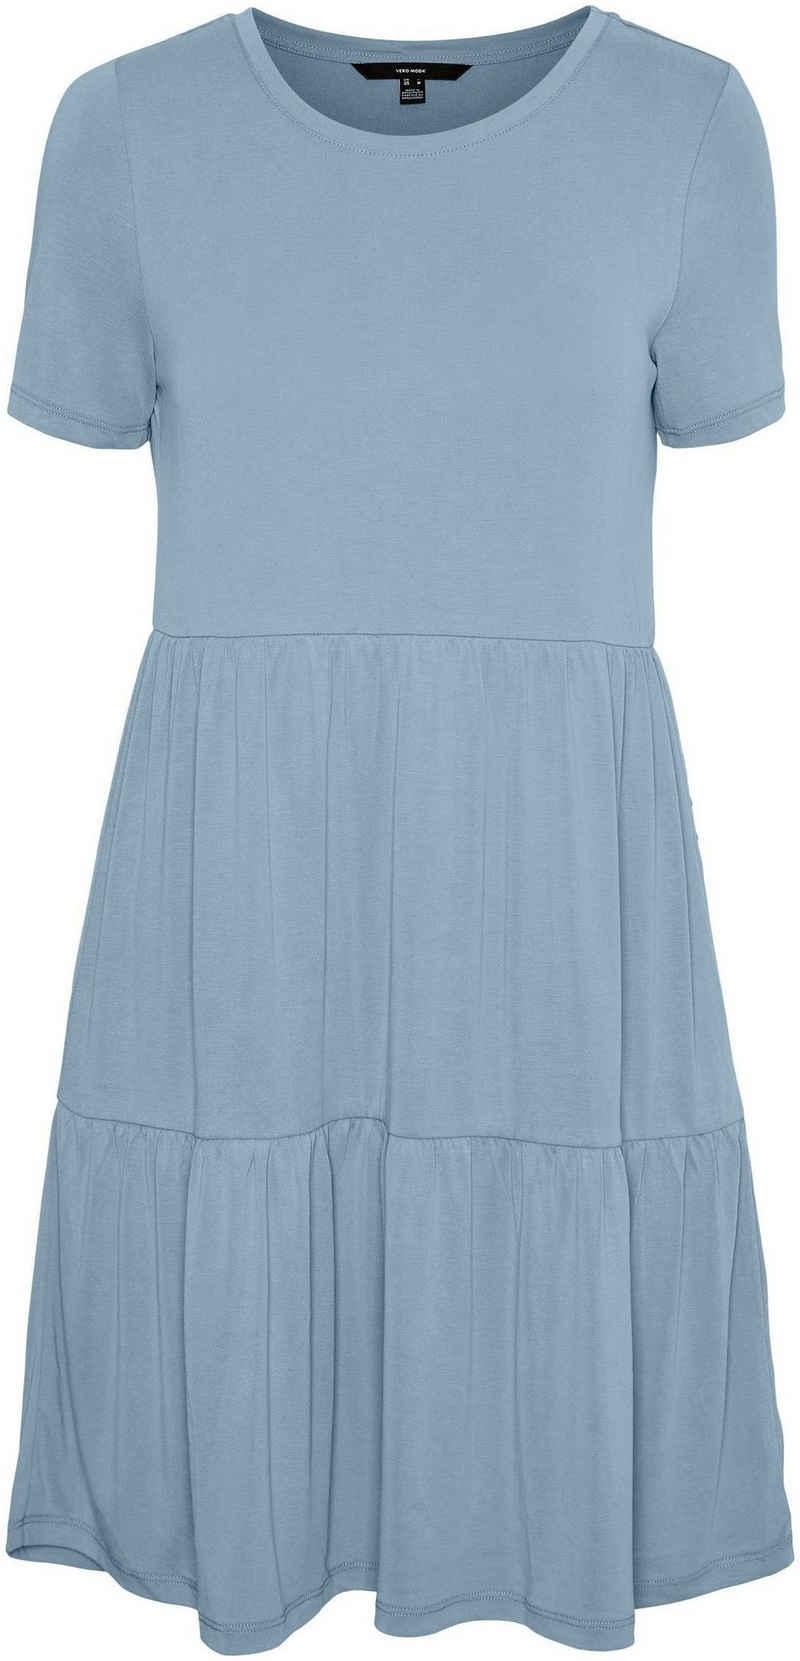 Vero Moda Shirtkleid »VMFILLI CALIA«